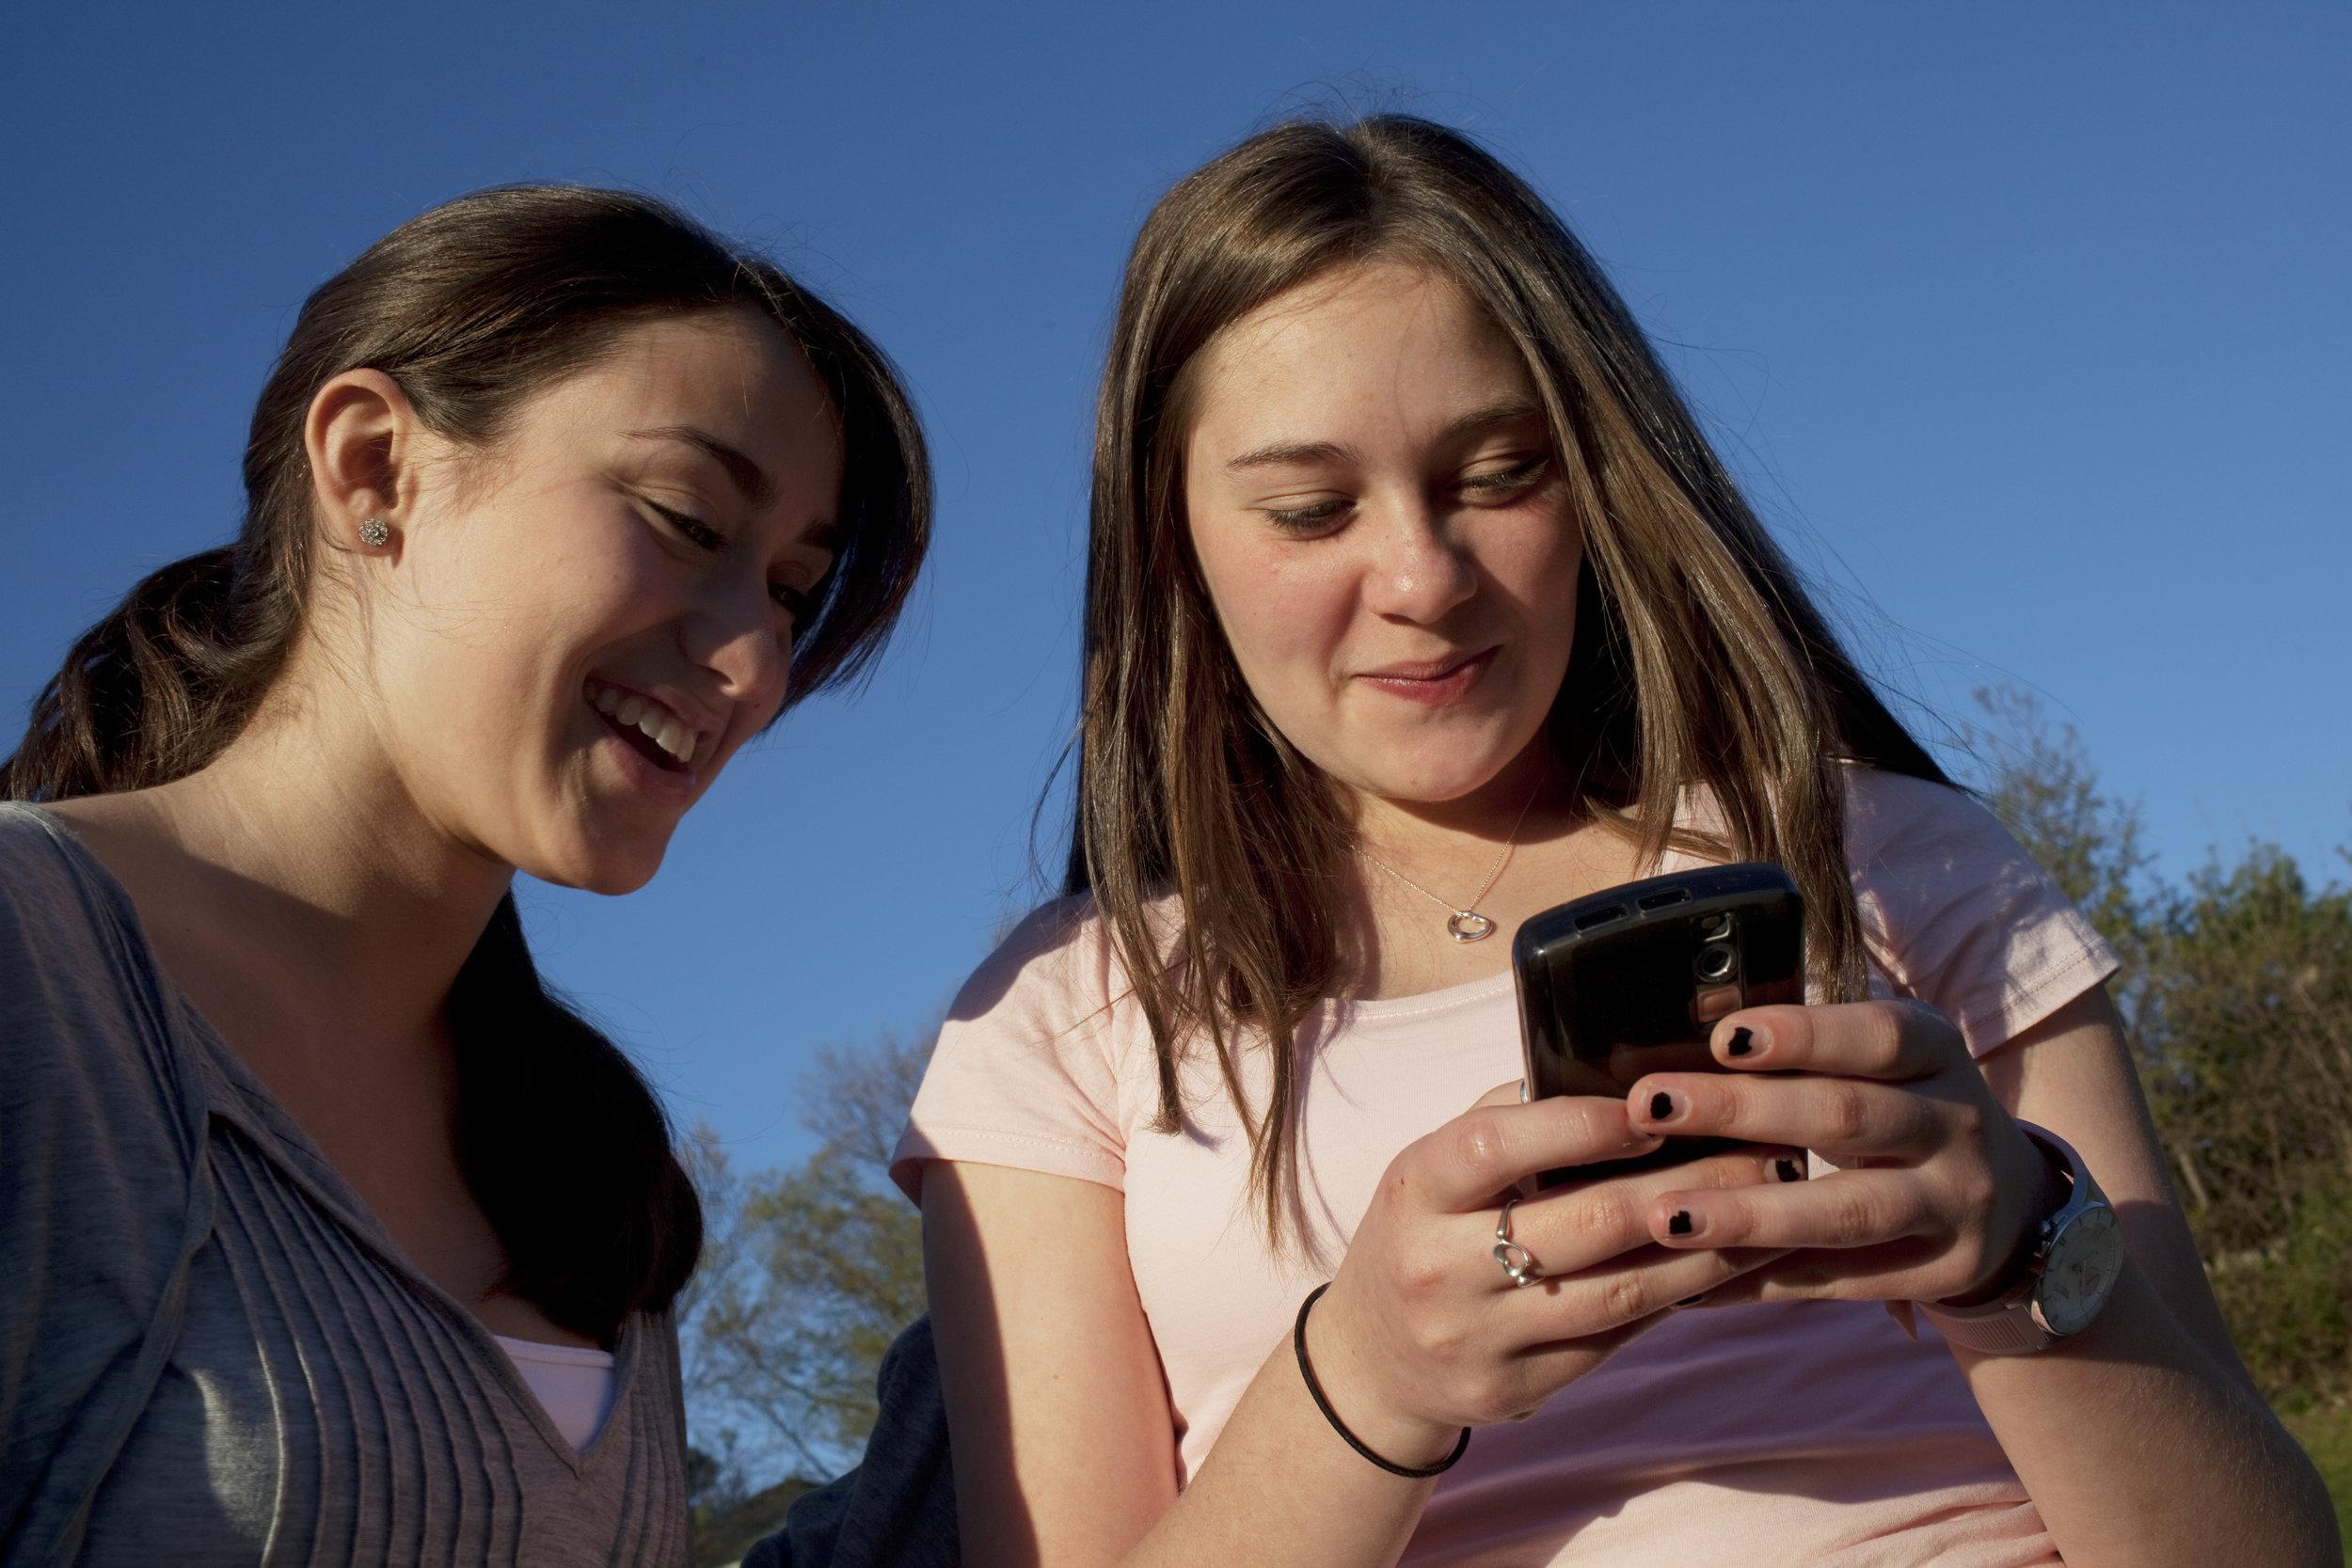 Two Teenage Girls Playing with Phone.jpg